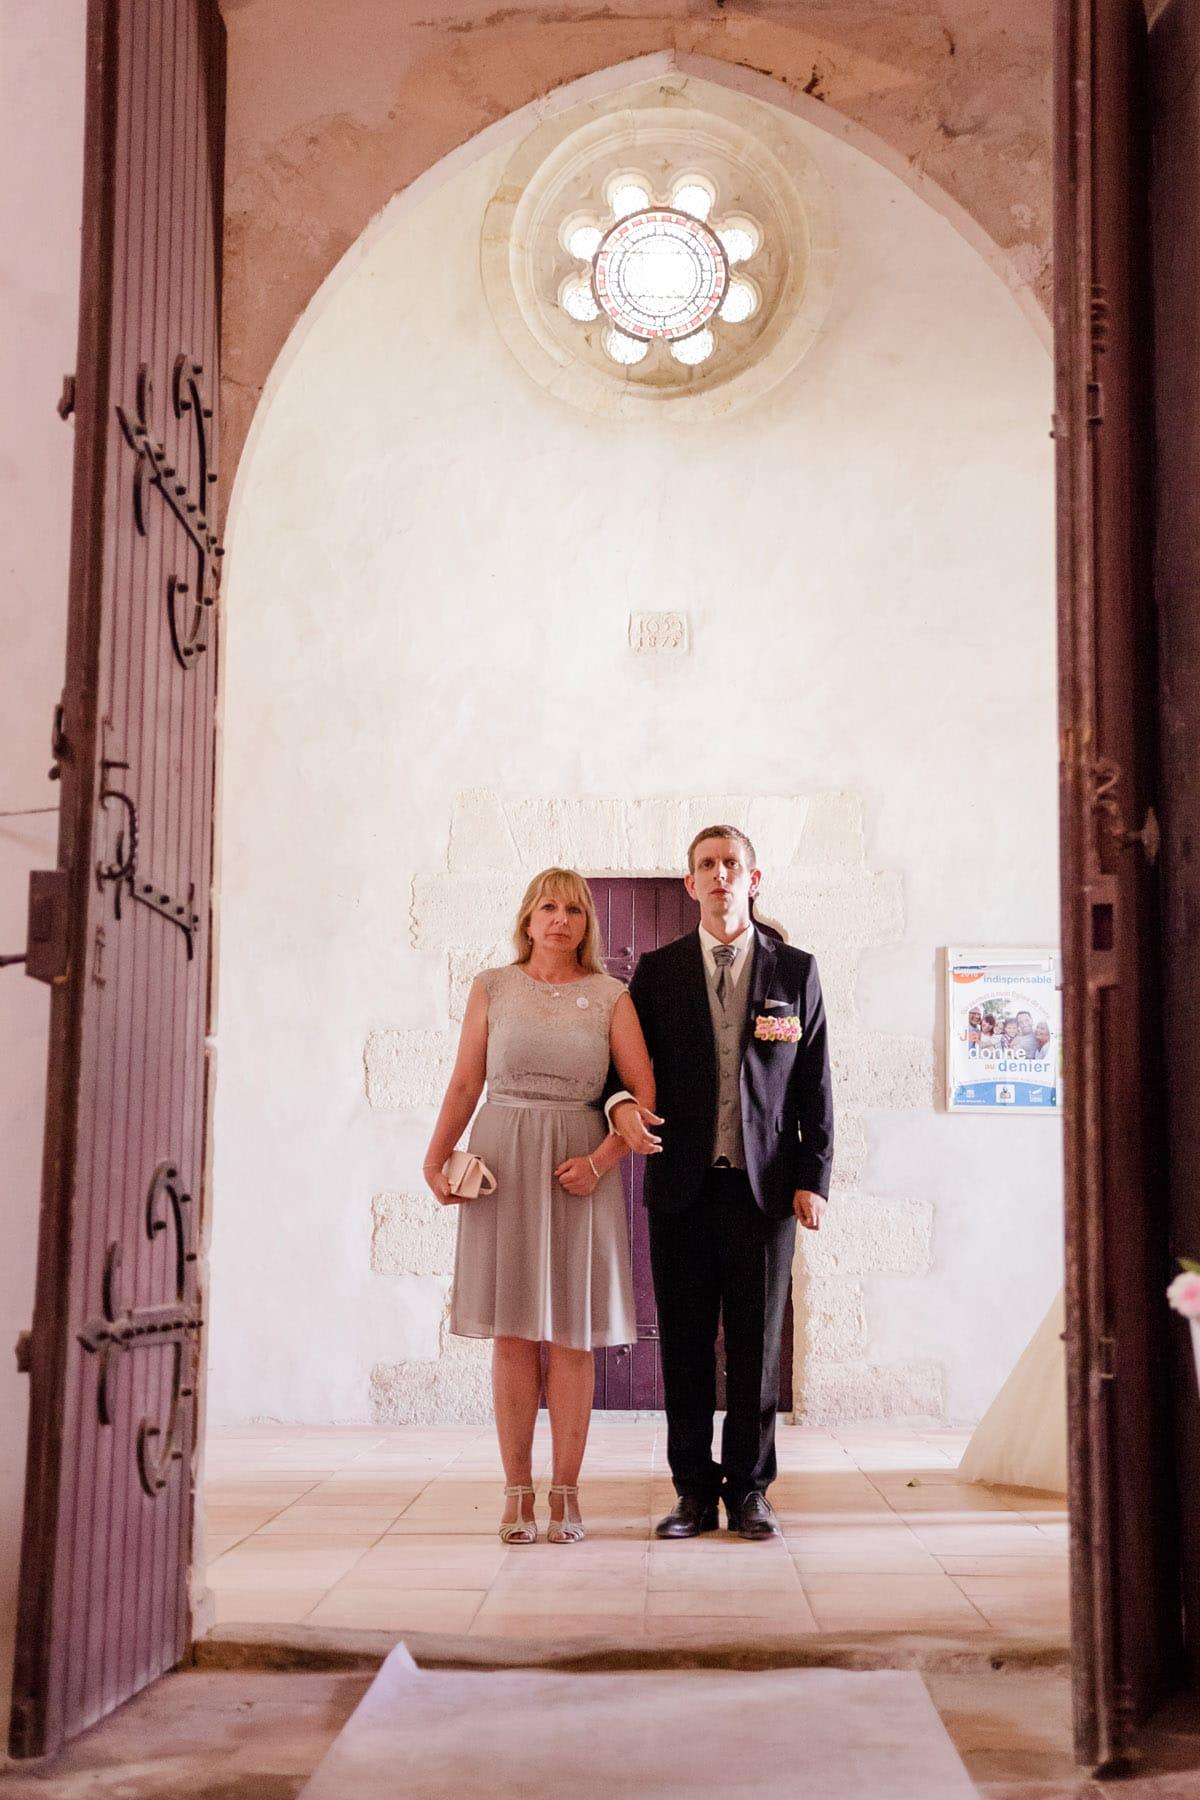 photographe mariage bordeaux landes fineart francais sarah miramon blog 10